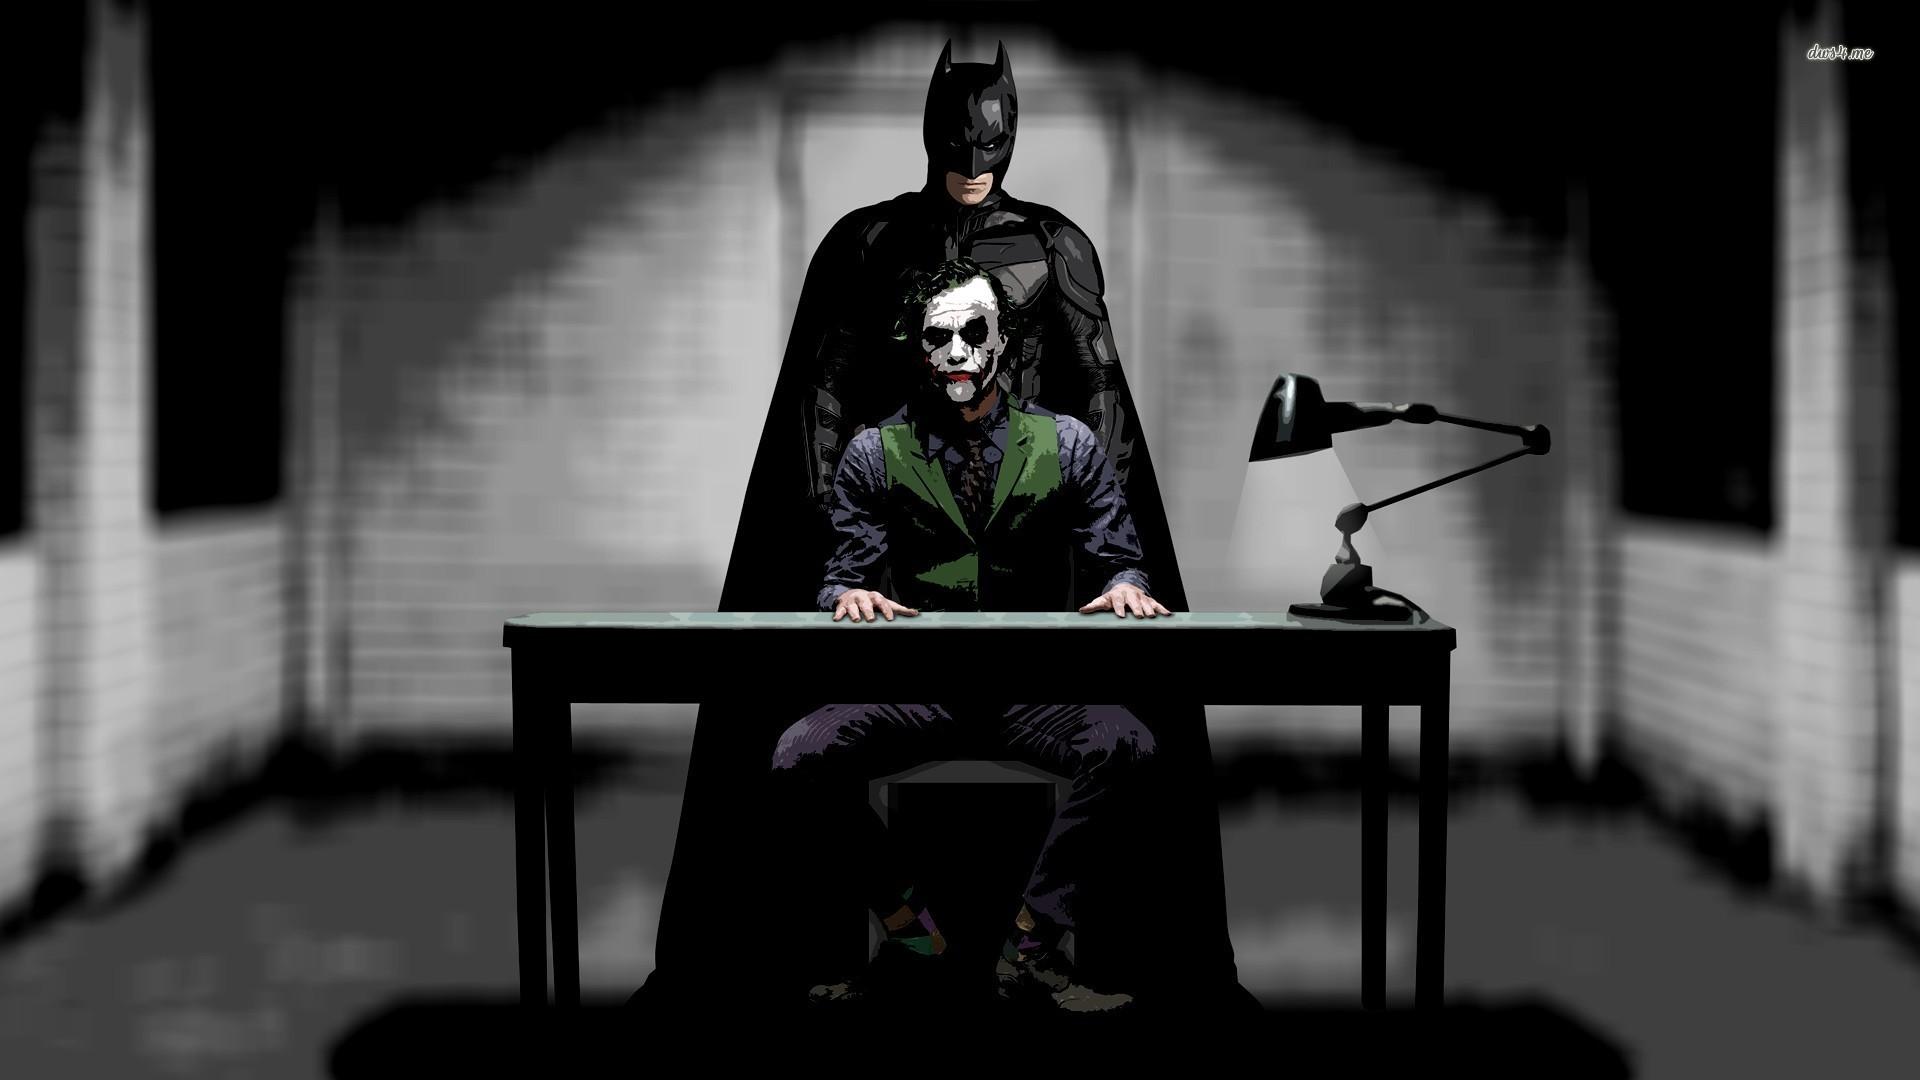 1920x1080 Memes For Dark Knight Joker Wallpaper